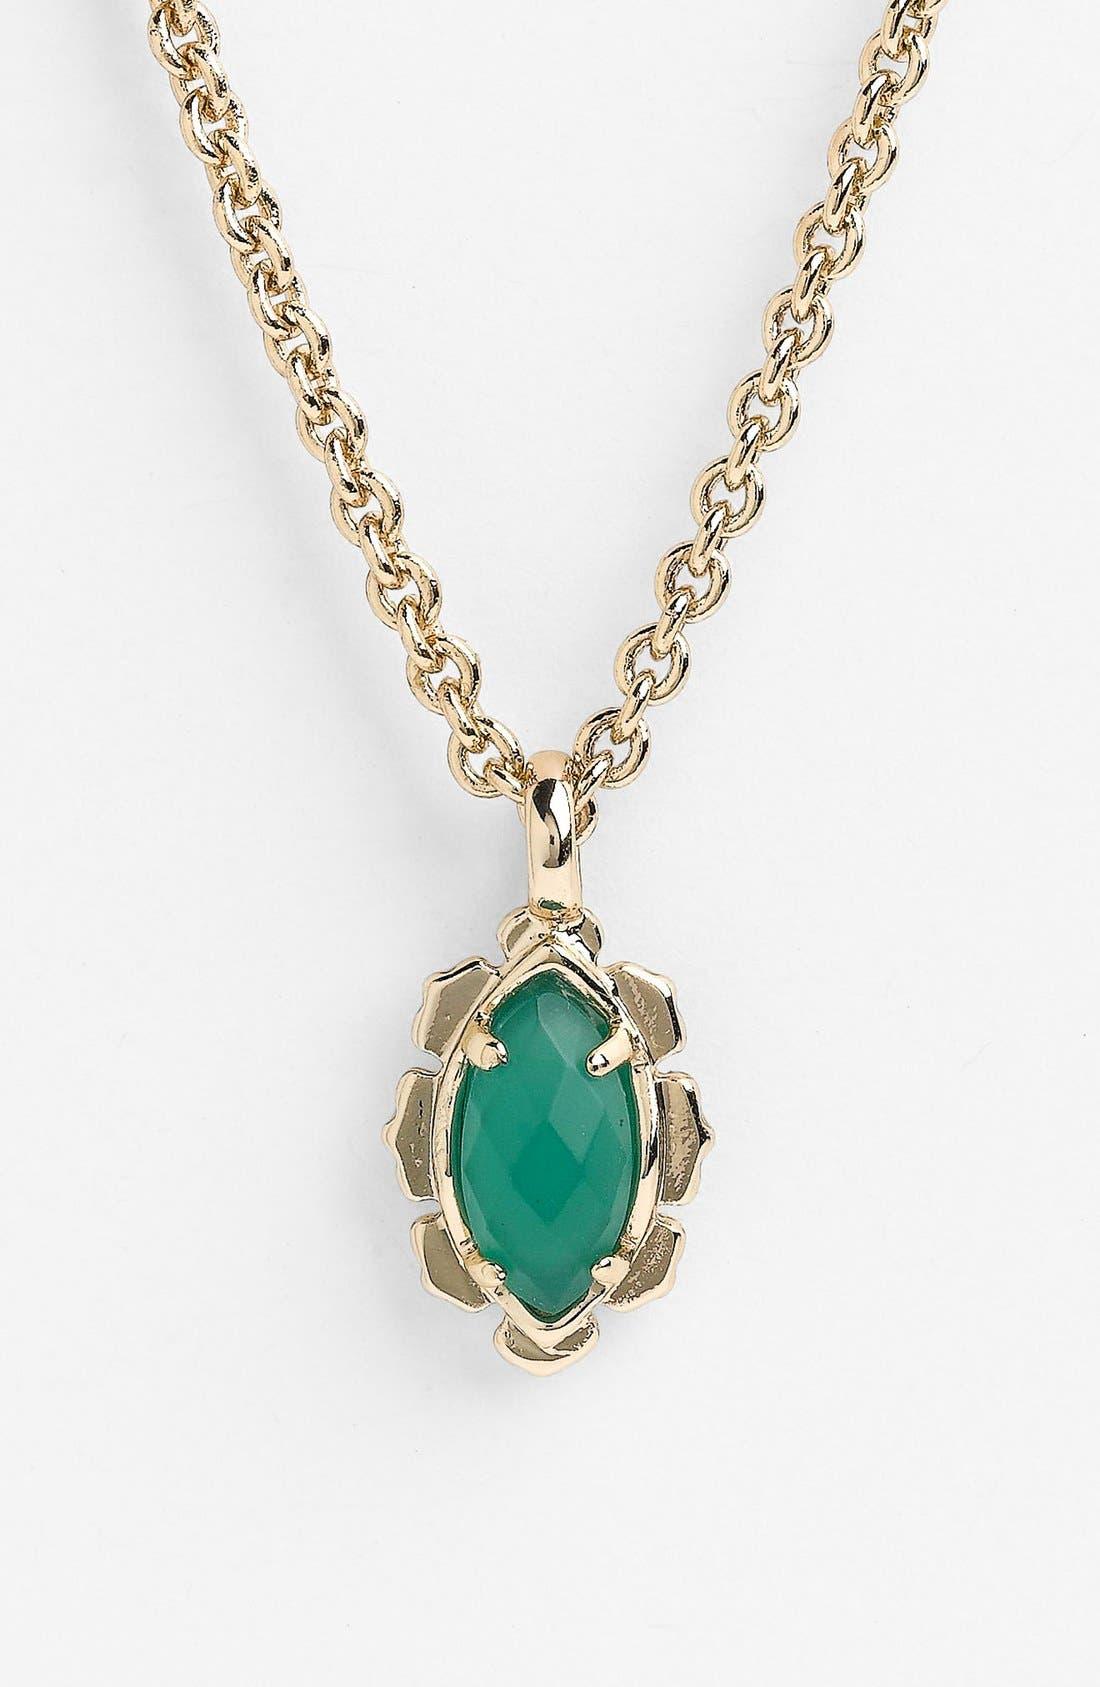 Alternate Image 1 Selected - Kendra Scott 'Lian' Stone Pendant Necklace (Nordstrom Exclusive)